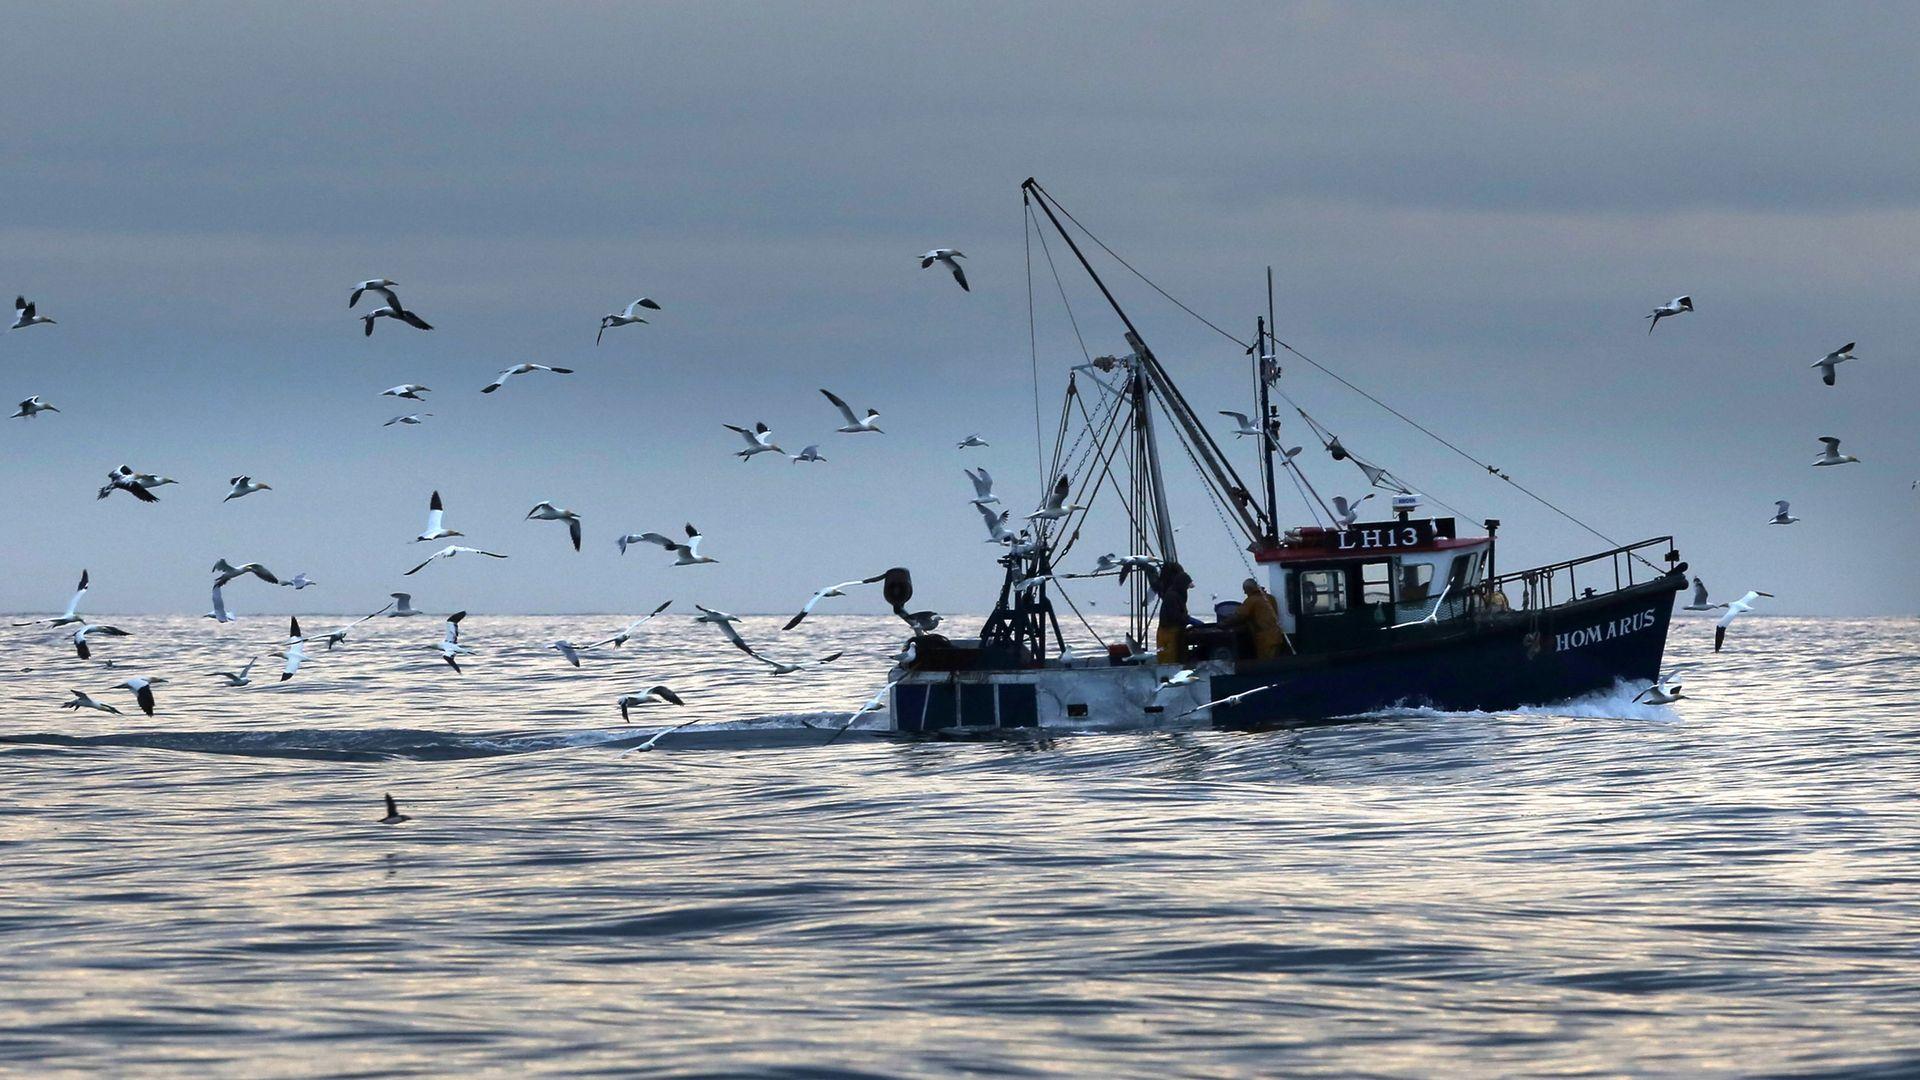 Scottish inshore fishermen at work off the east coast of Scotland, near Bass rock. - Credit: PA